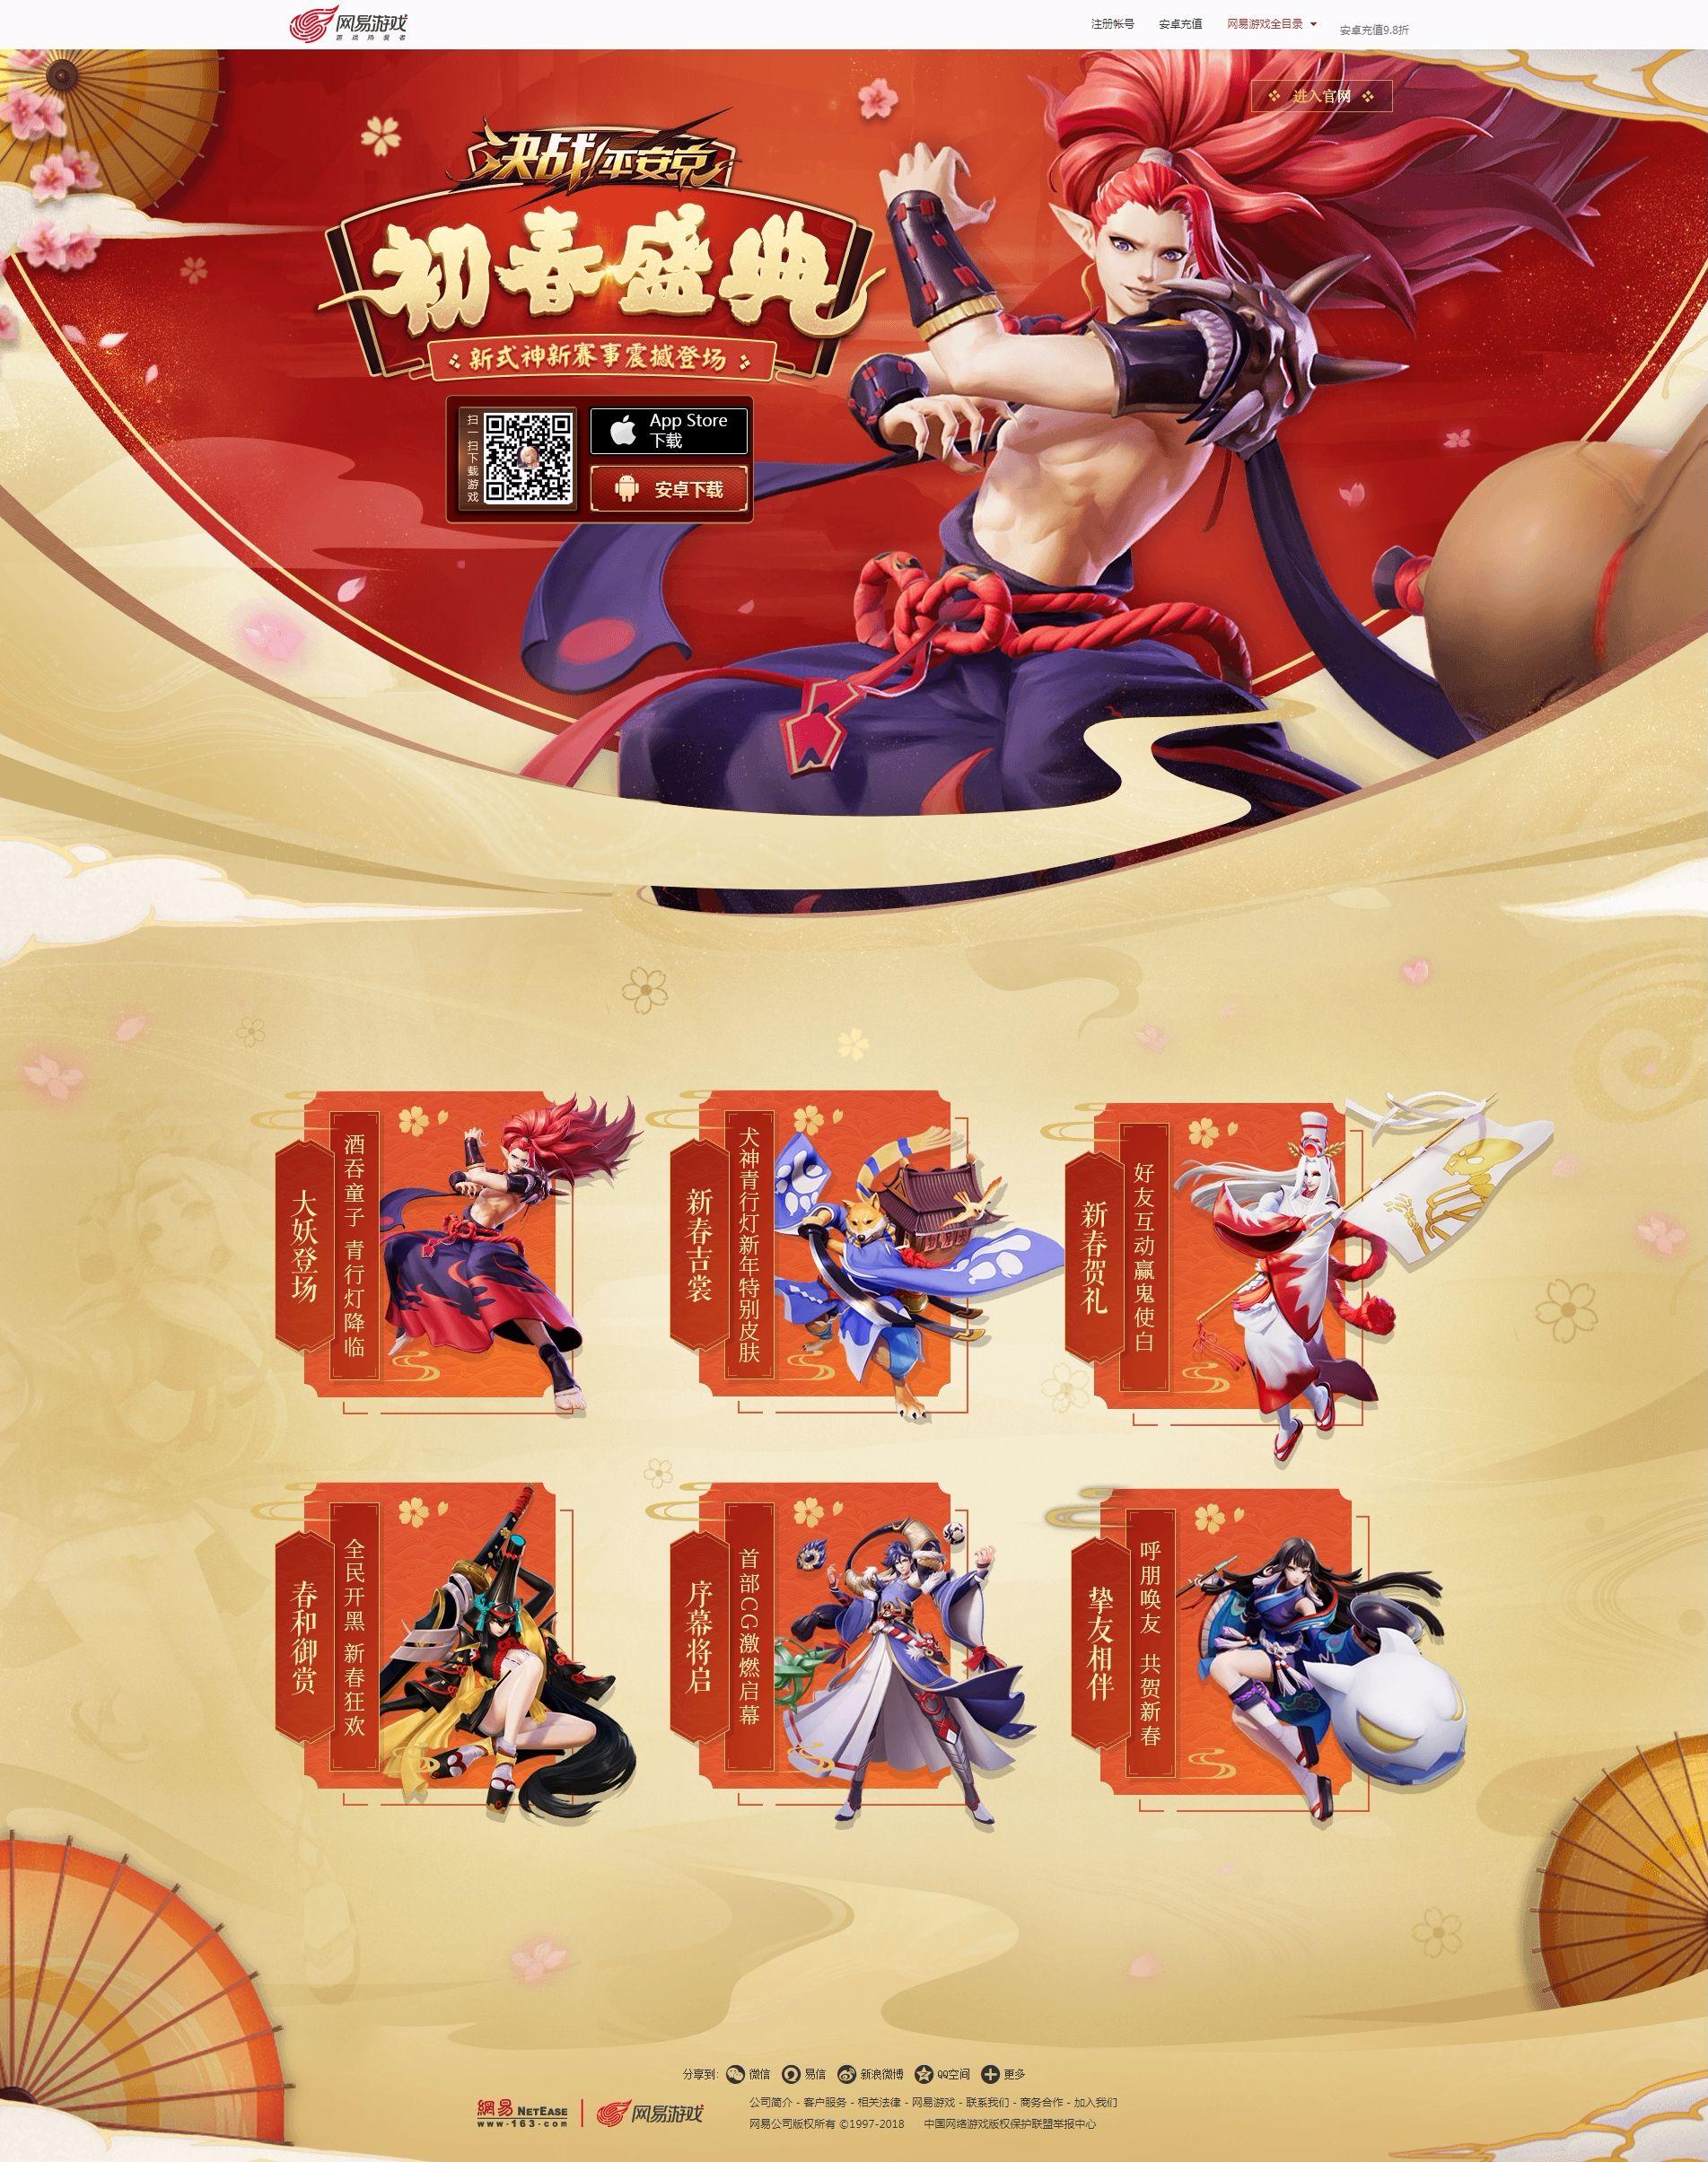 Peaceful Beijing NetEase mobile gameCHINESE DESIGN WORKS